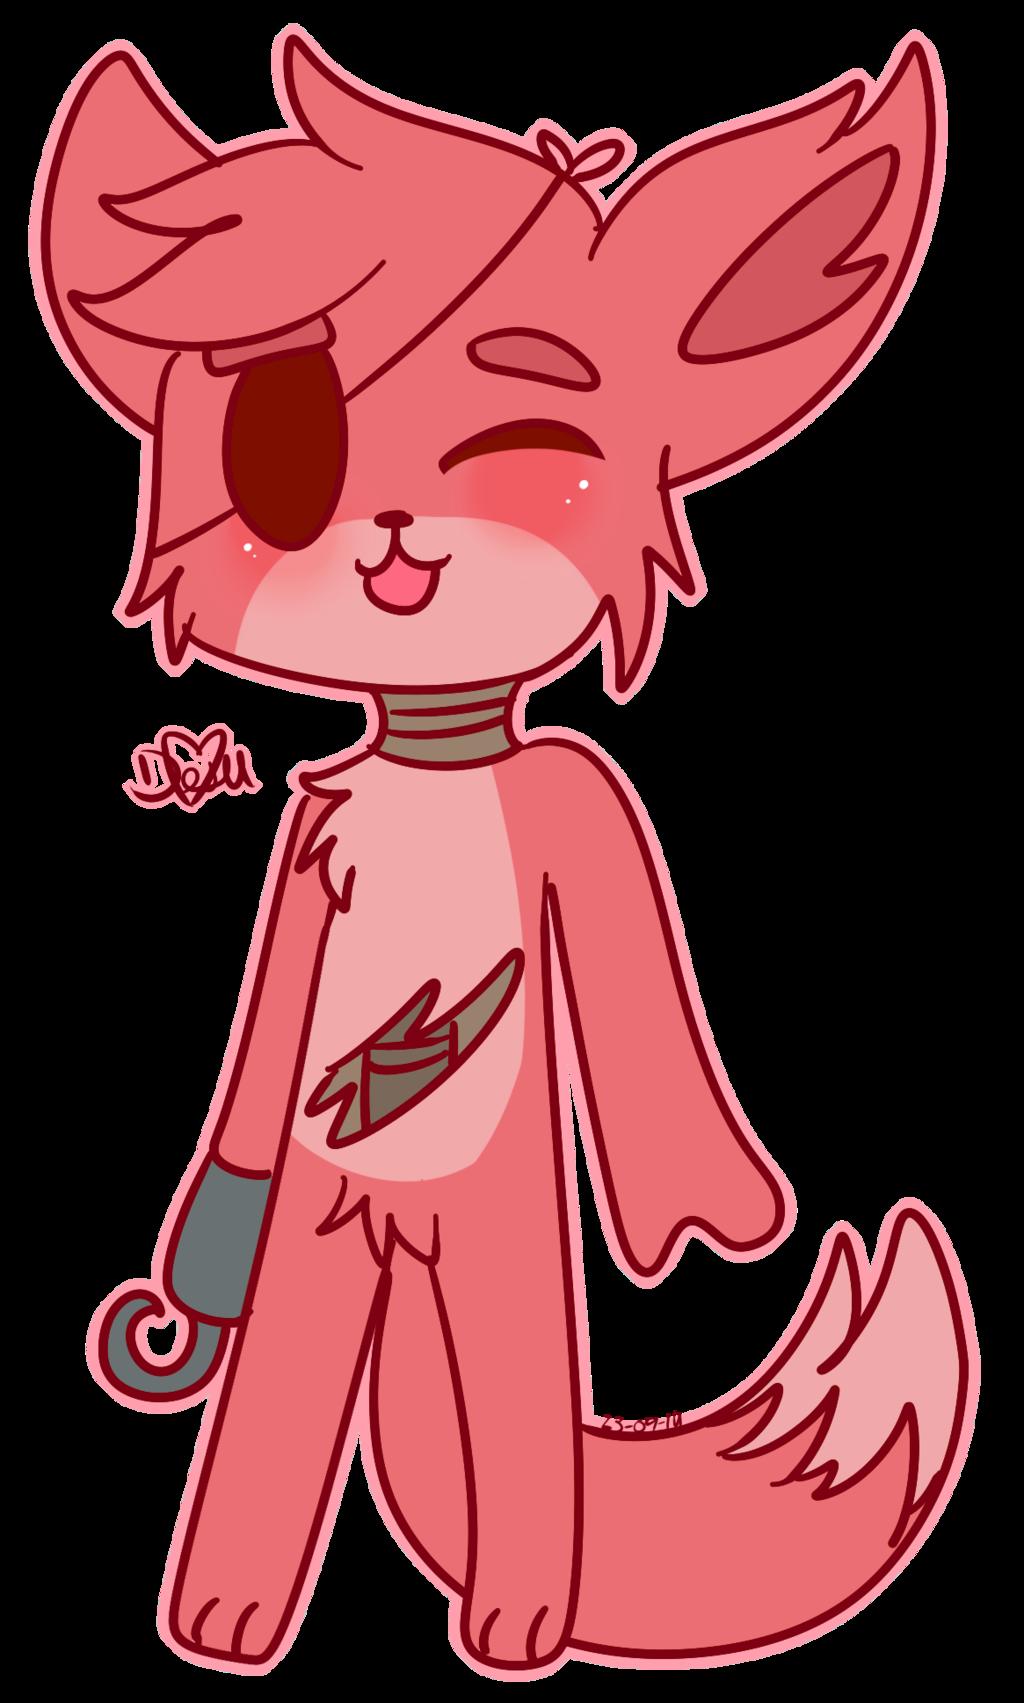 Kawaii Foxy By Chicapitufa On Deviantart Fnaf Fnaf Foxy Anime Fnaf